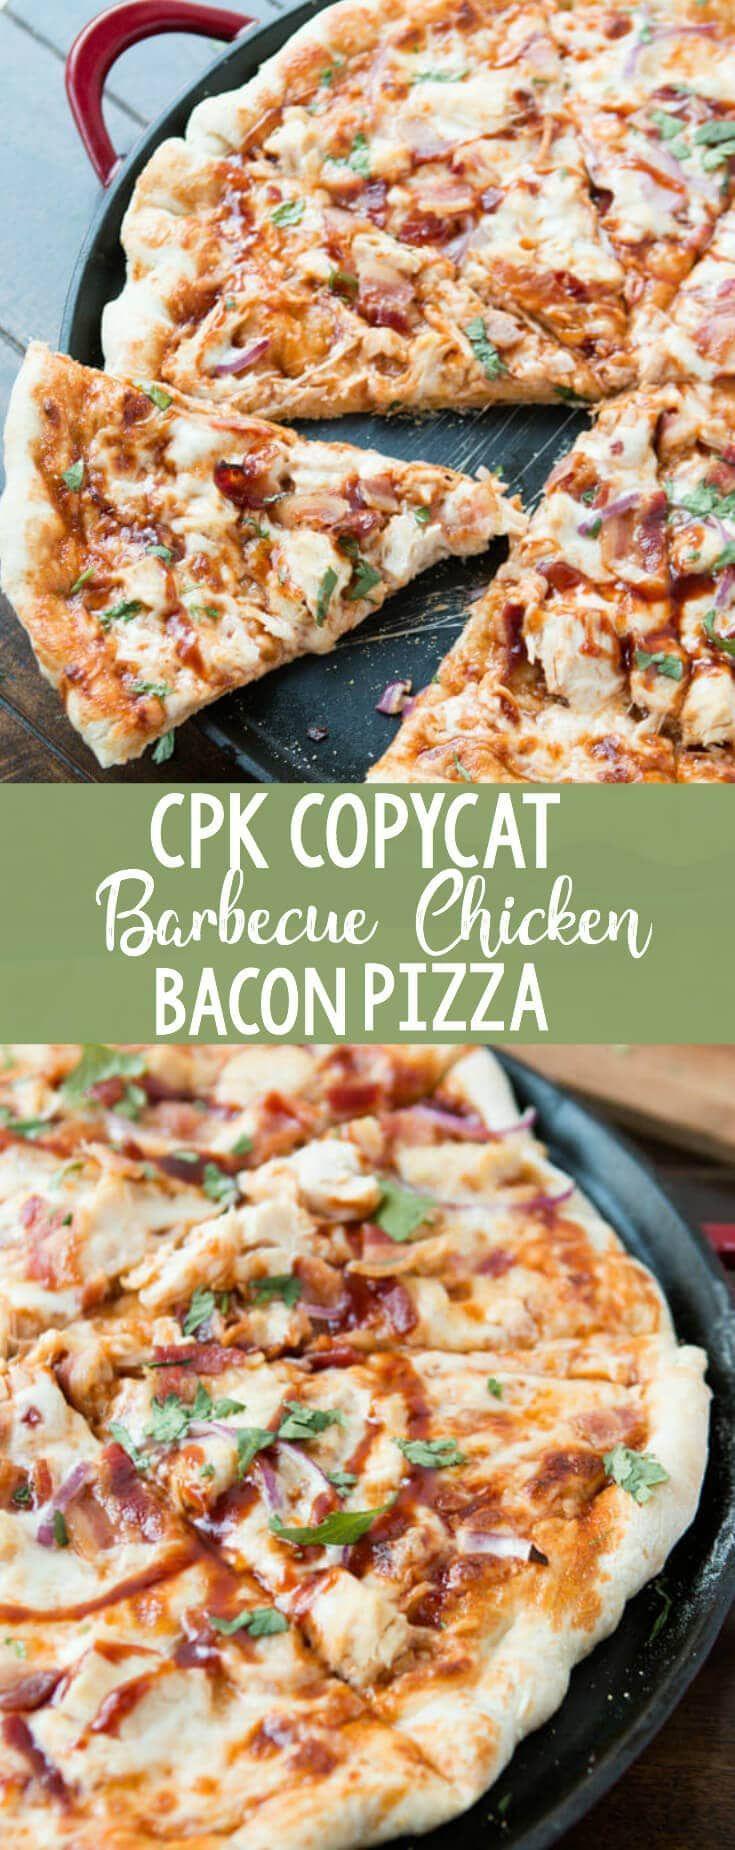 We love this copycat recipe Copycat California Pizza Kitchen BBQ Chicken Bacon  Food